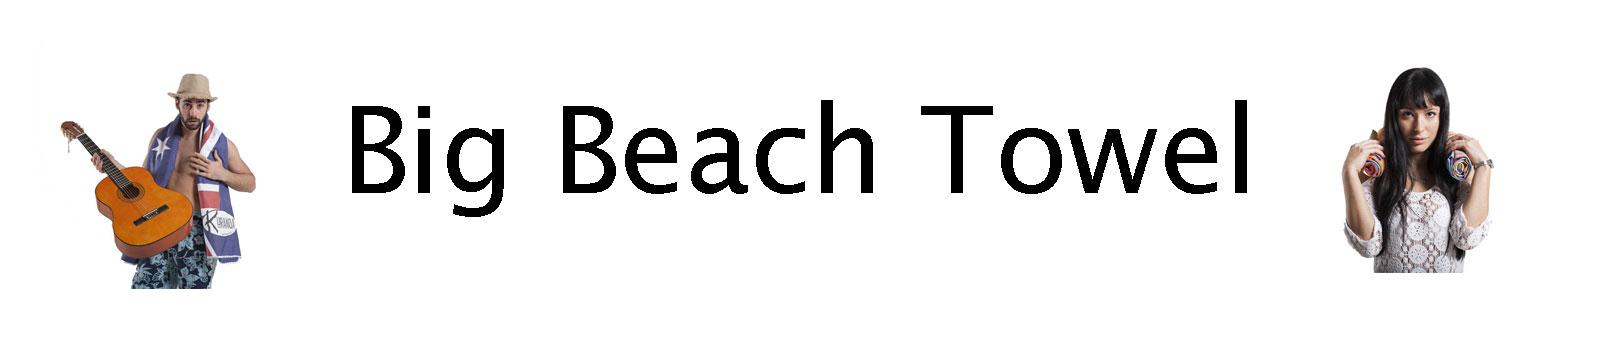 Big Beach Towel